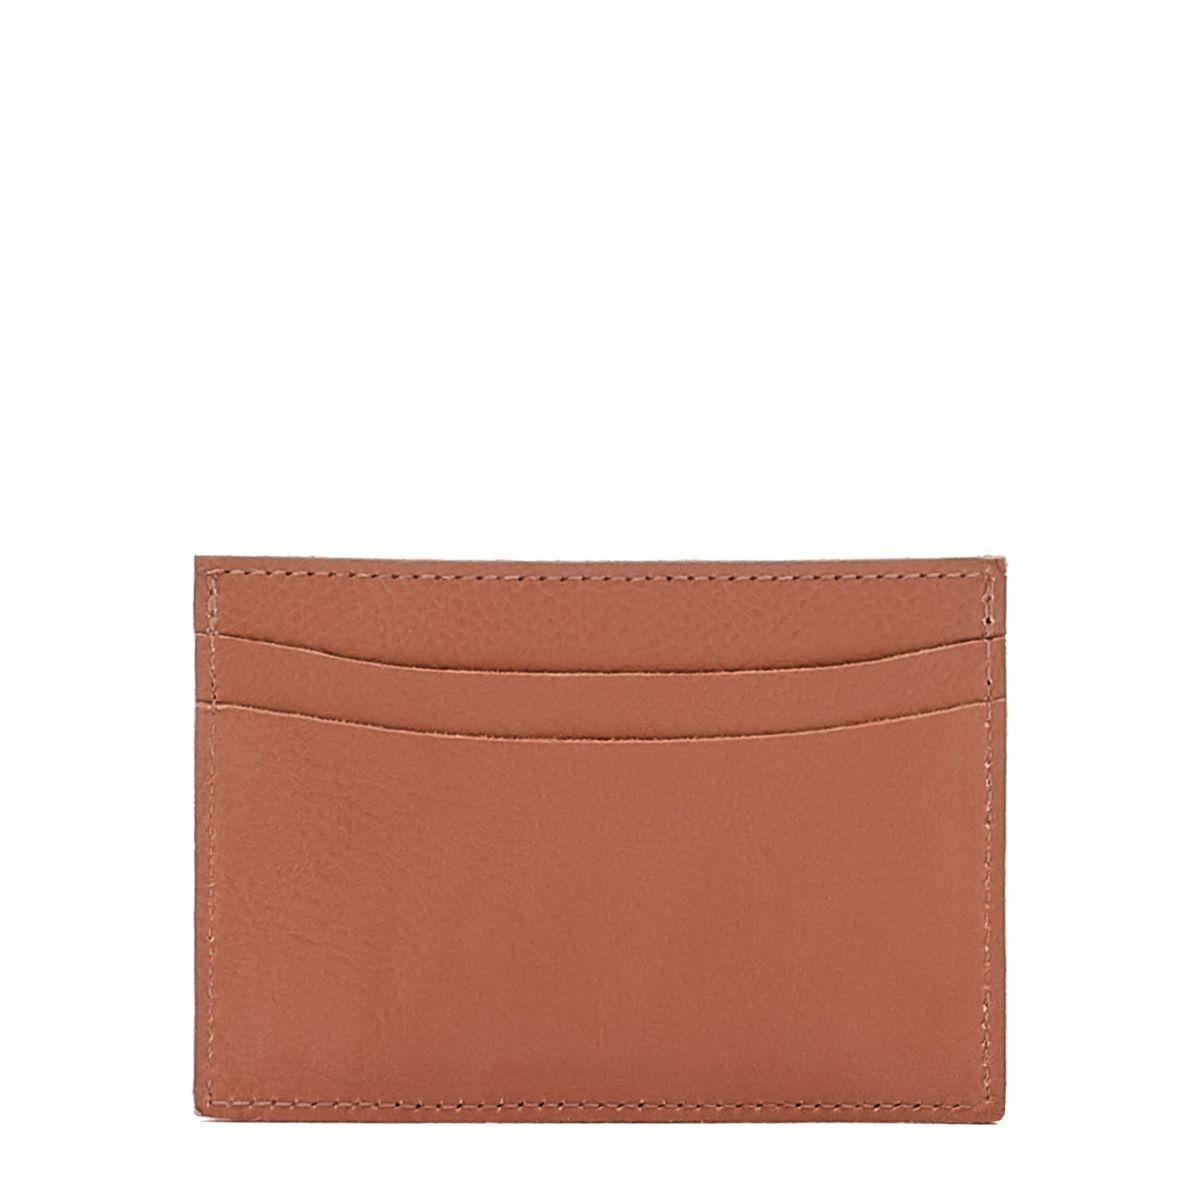 Card Case in Cowhide Leather SCC019 color Pink Pepper | Details